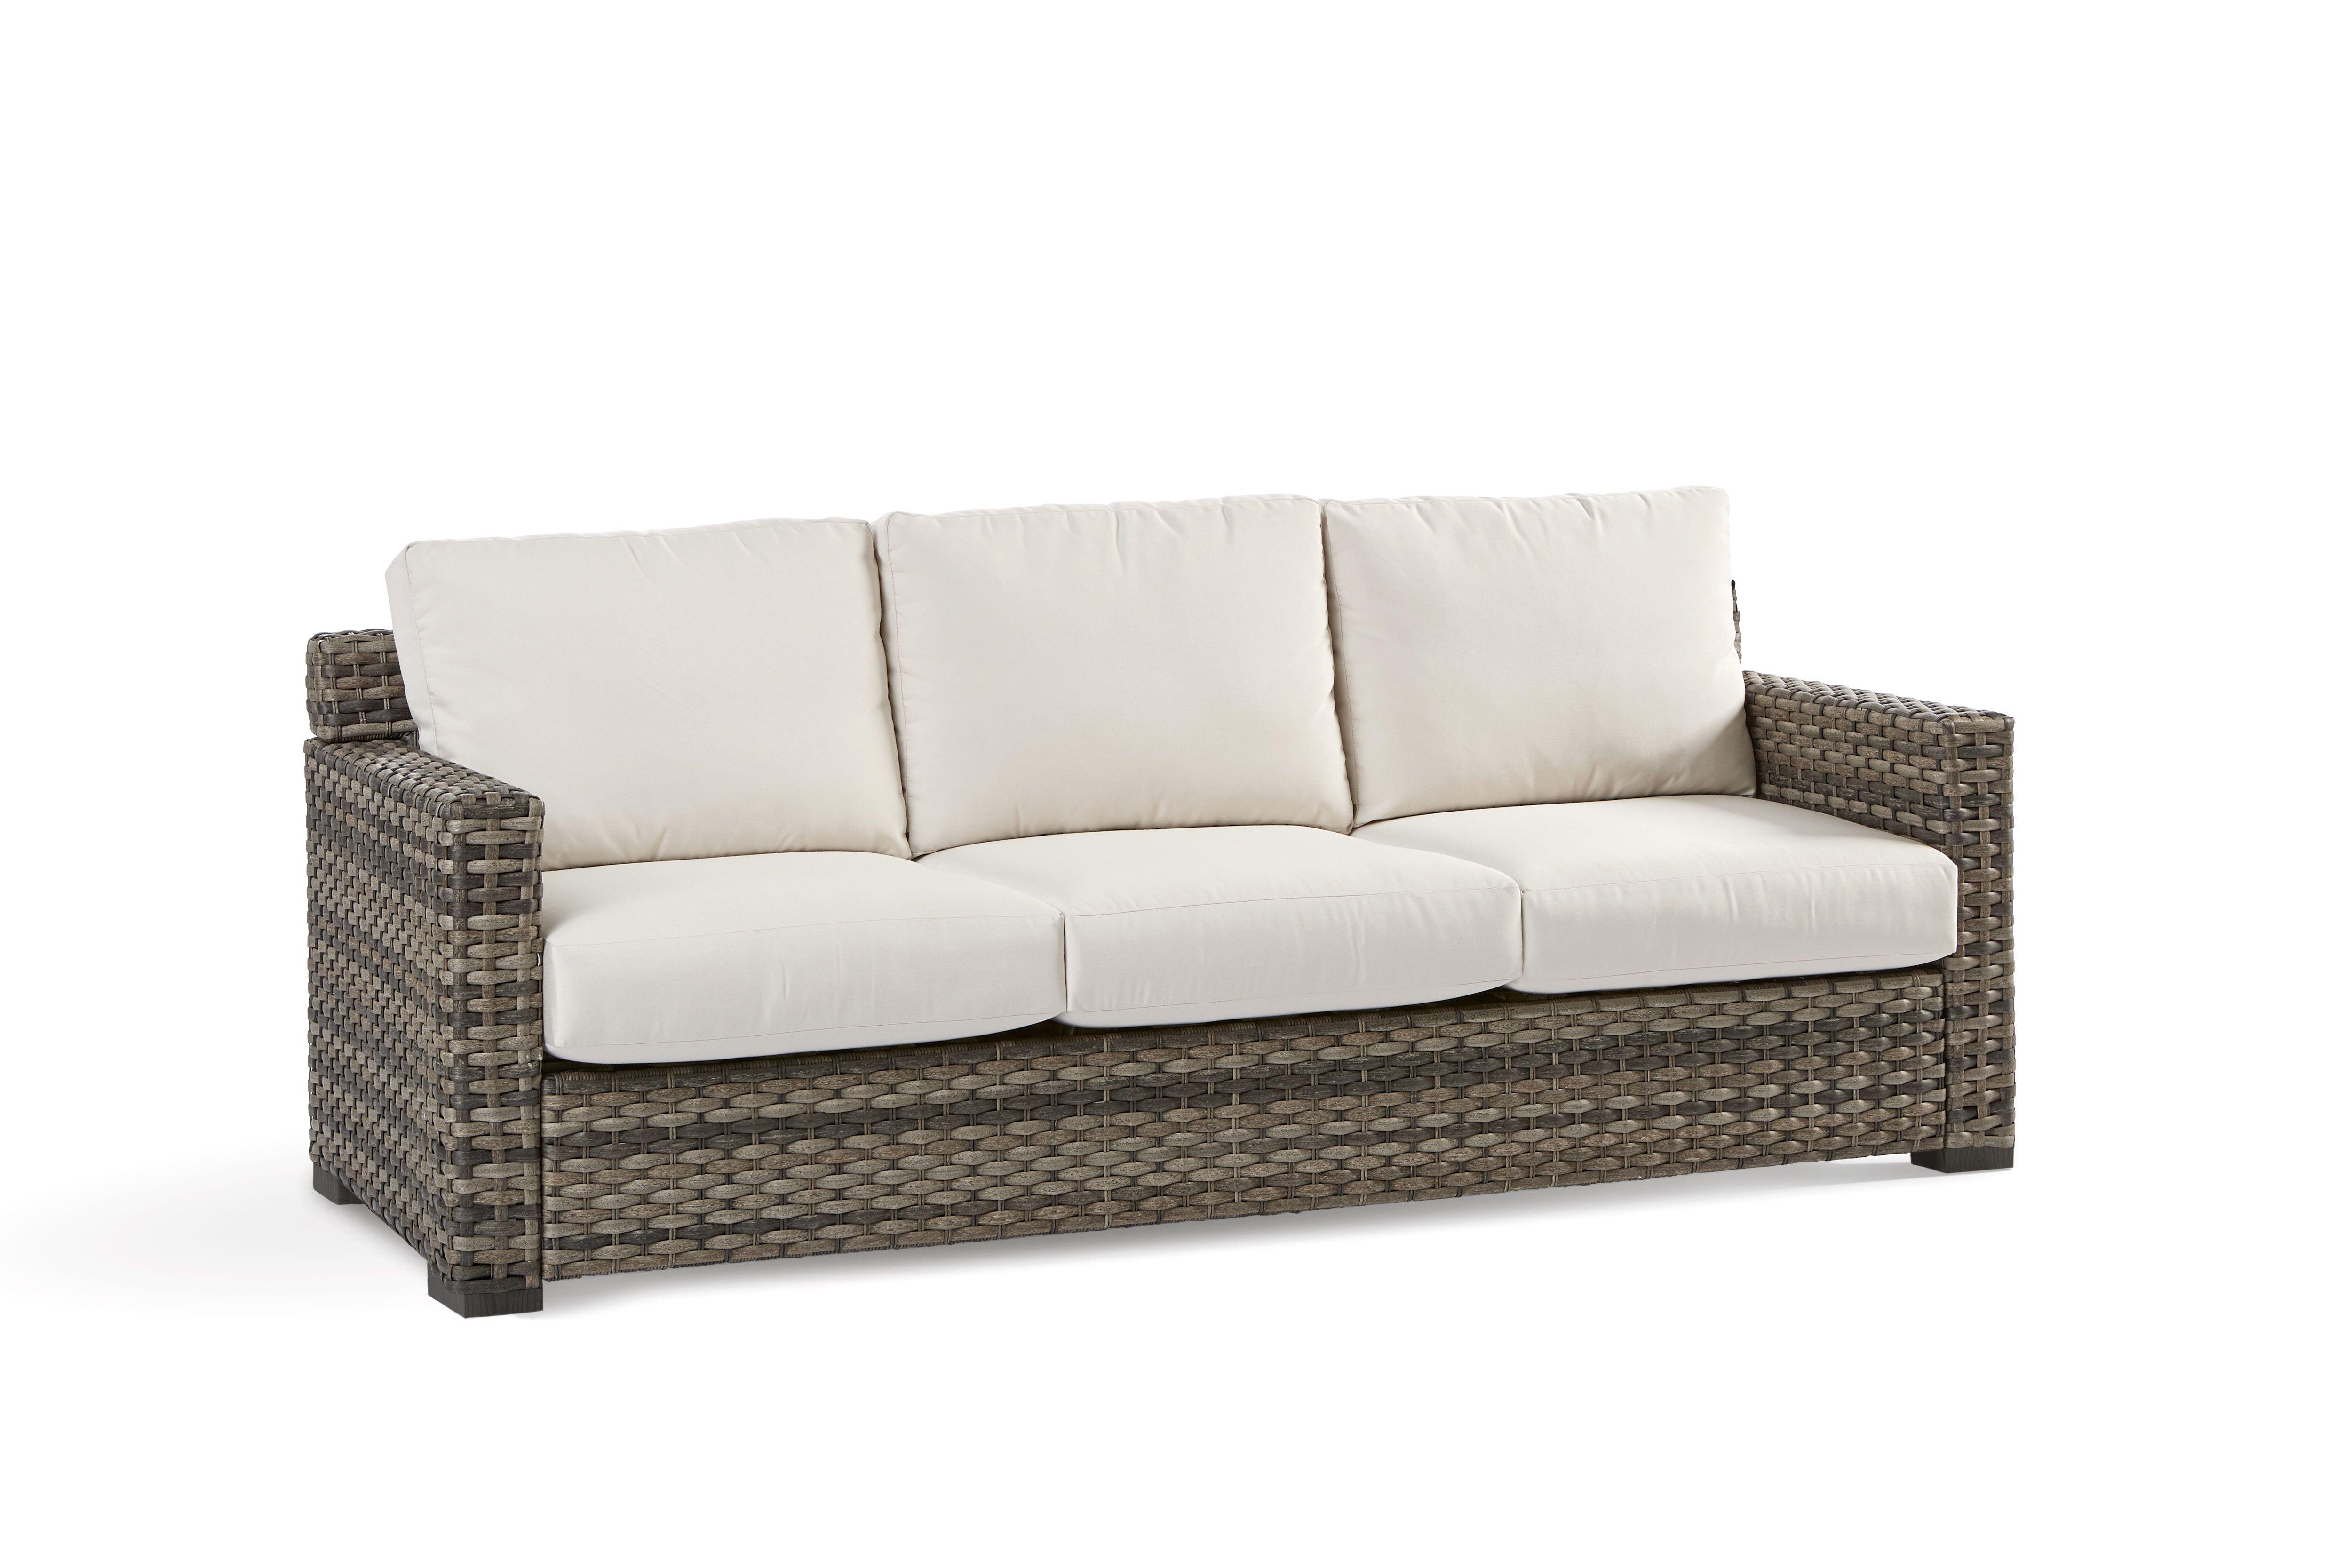 Jakarta Patio Sofa With Sunbrella Cushion Sofa Pictures Outdoor